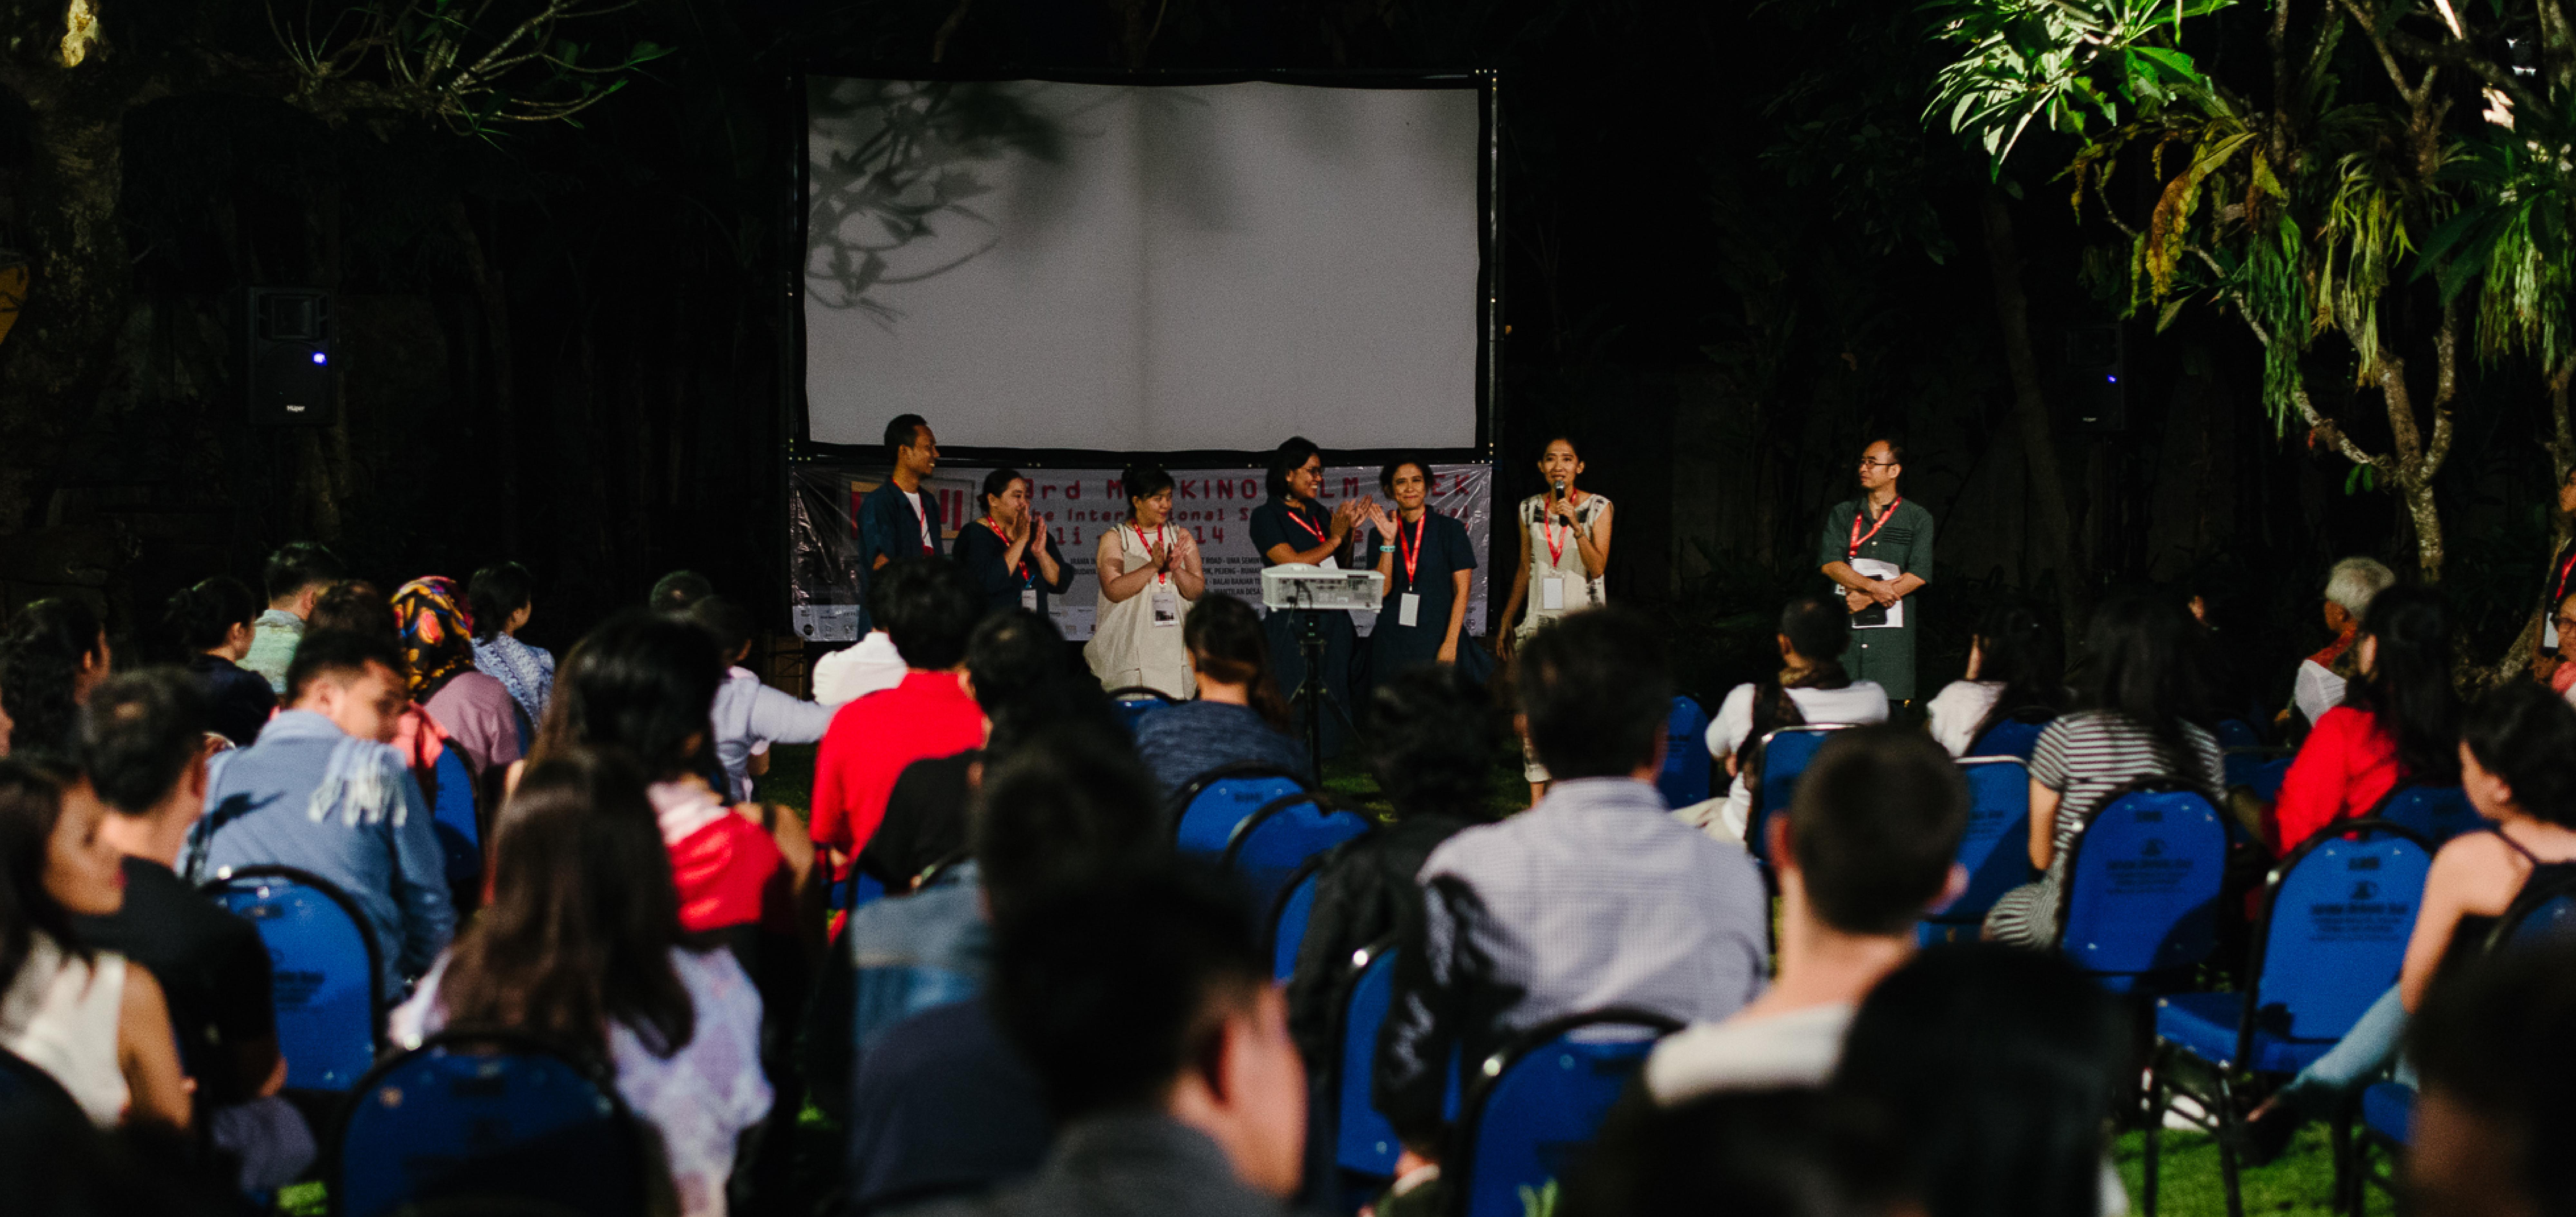 PERTAMA KALI, MINIKINO BAWA FILM PENDEK INDONESIA KE AUSTIN FILM FESTIVAL DI AMERIKA